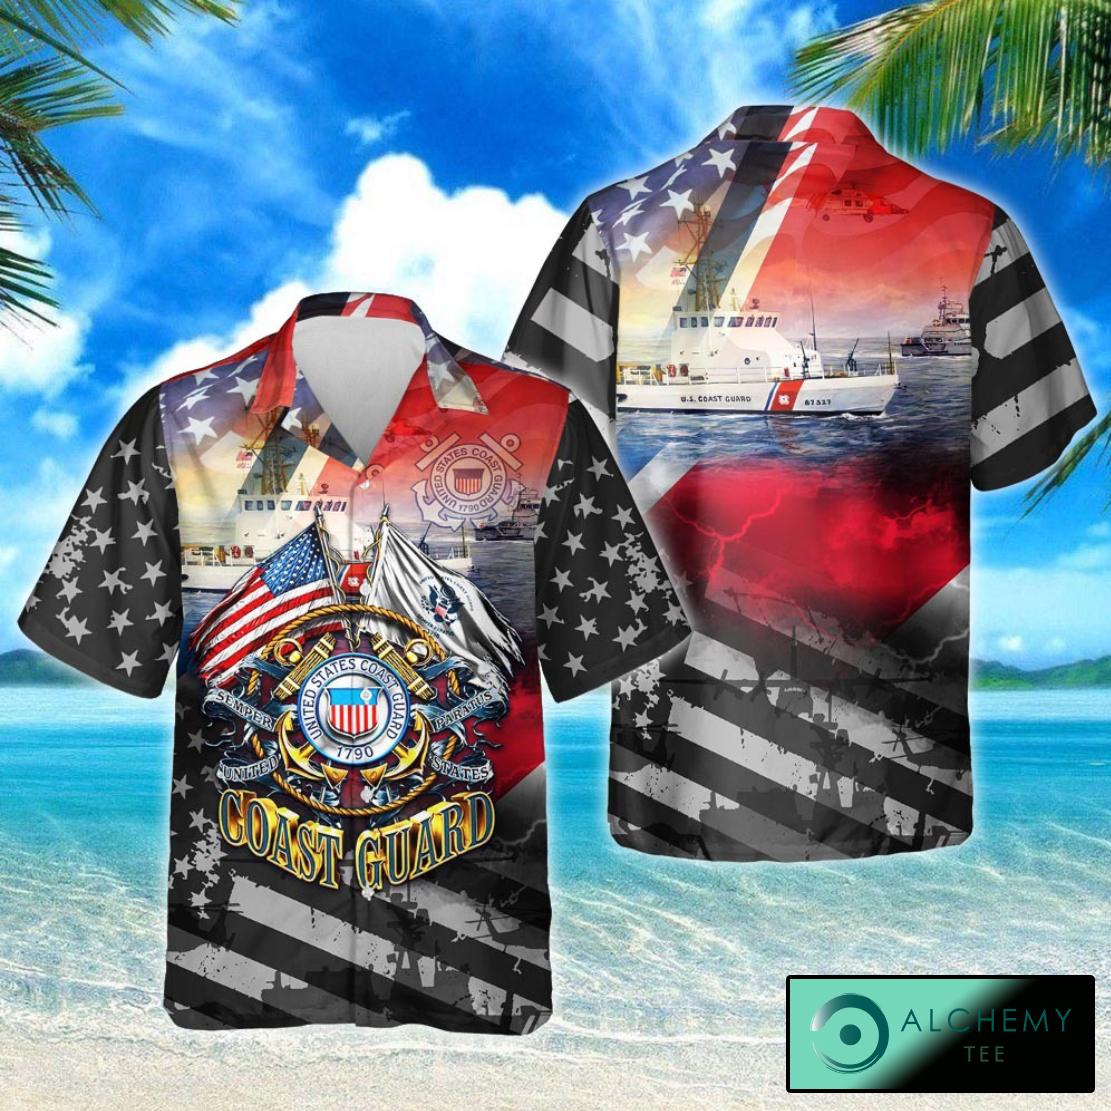 Proudly served U.S Coast Guard short sleeve hawaiian shirt